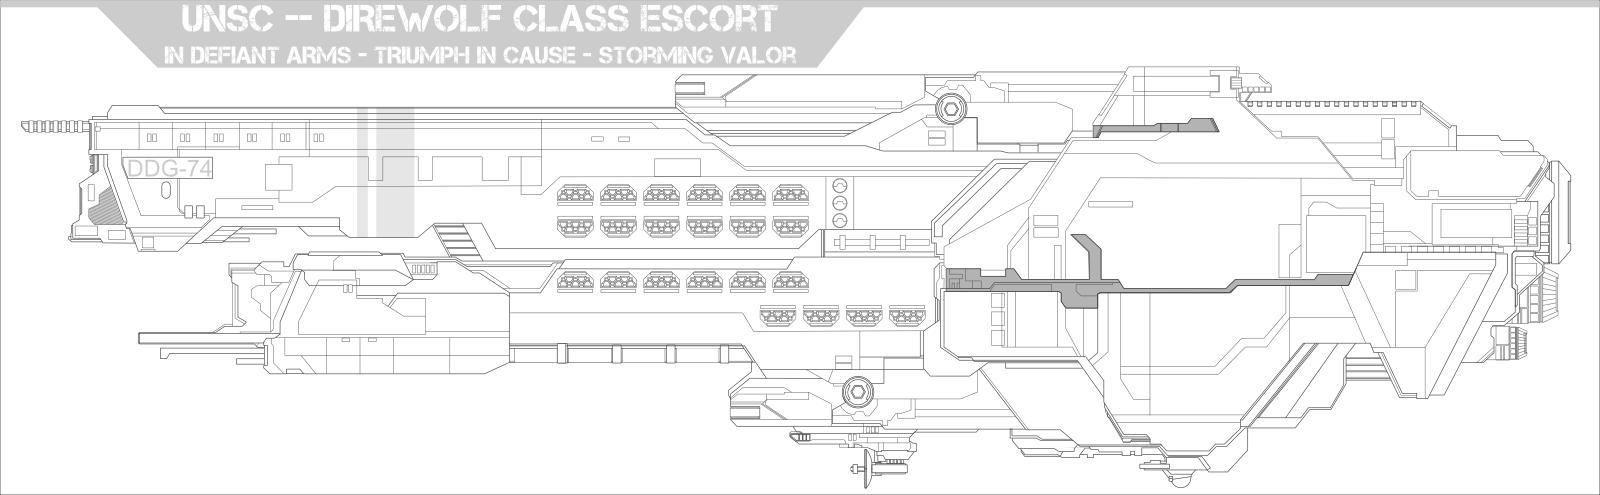 UNSC Direwolf Class Escort by Jon-Michael-May